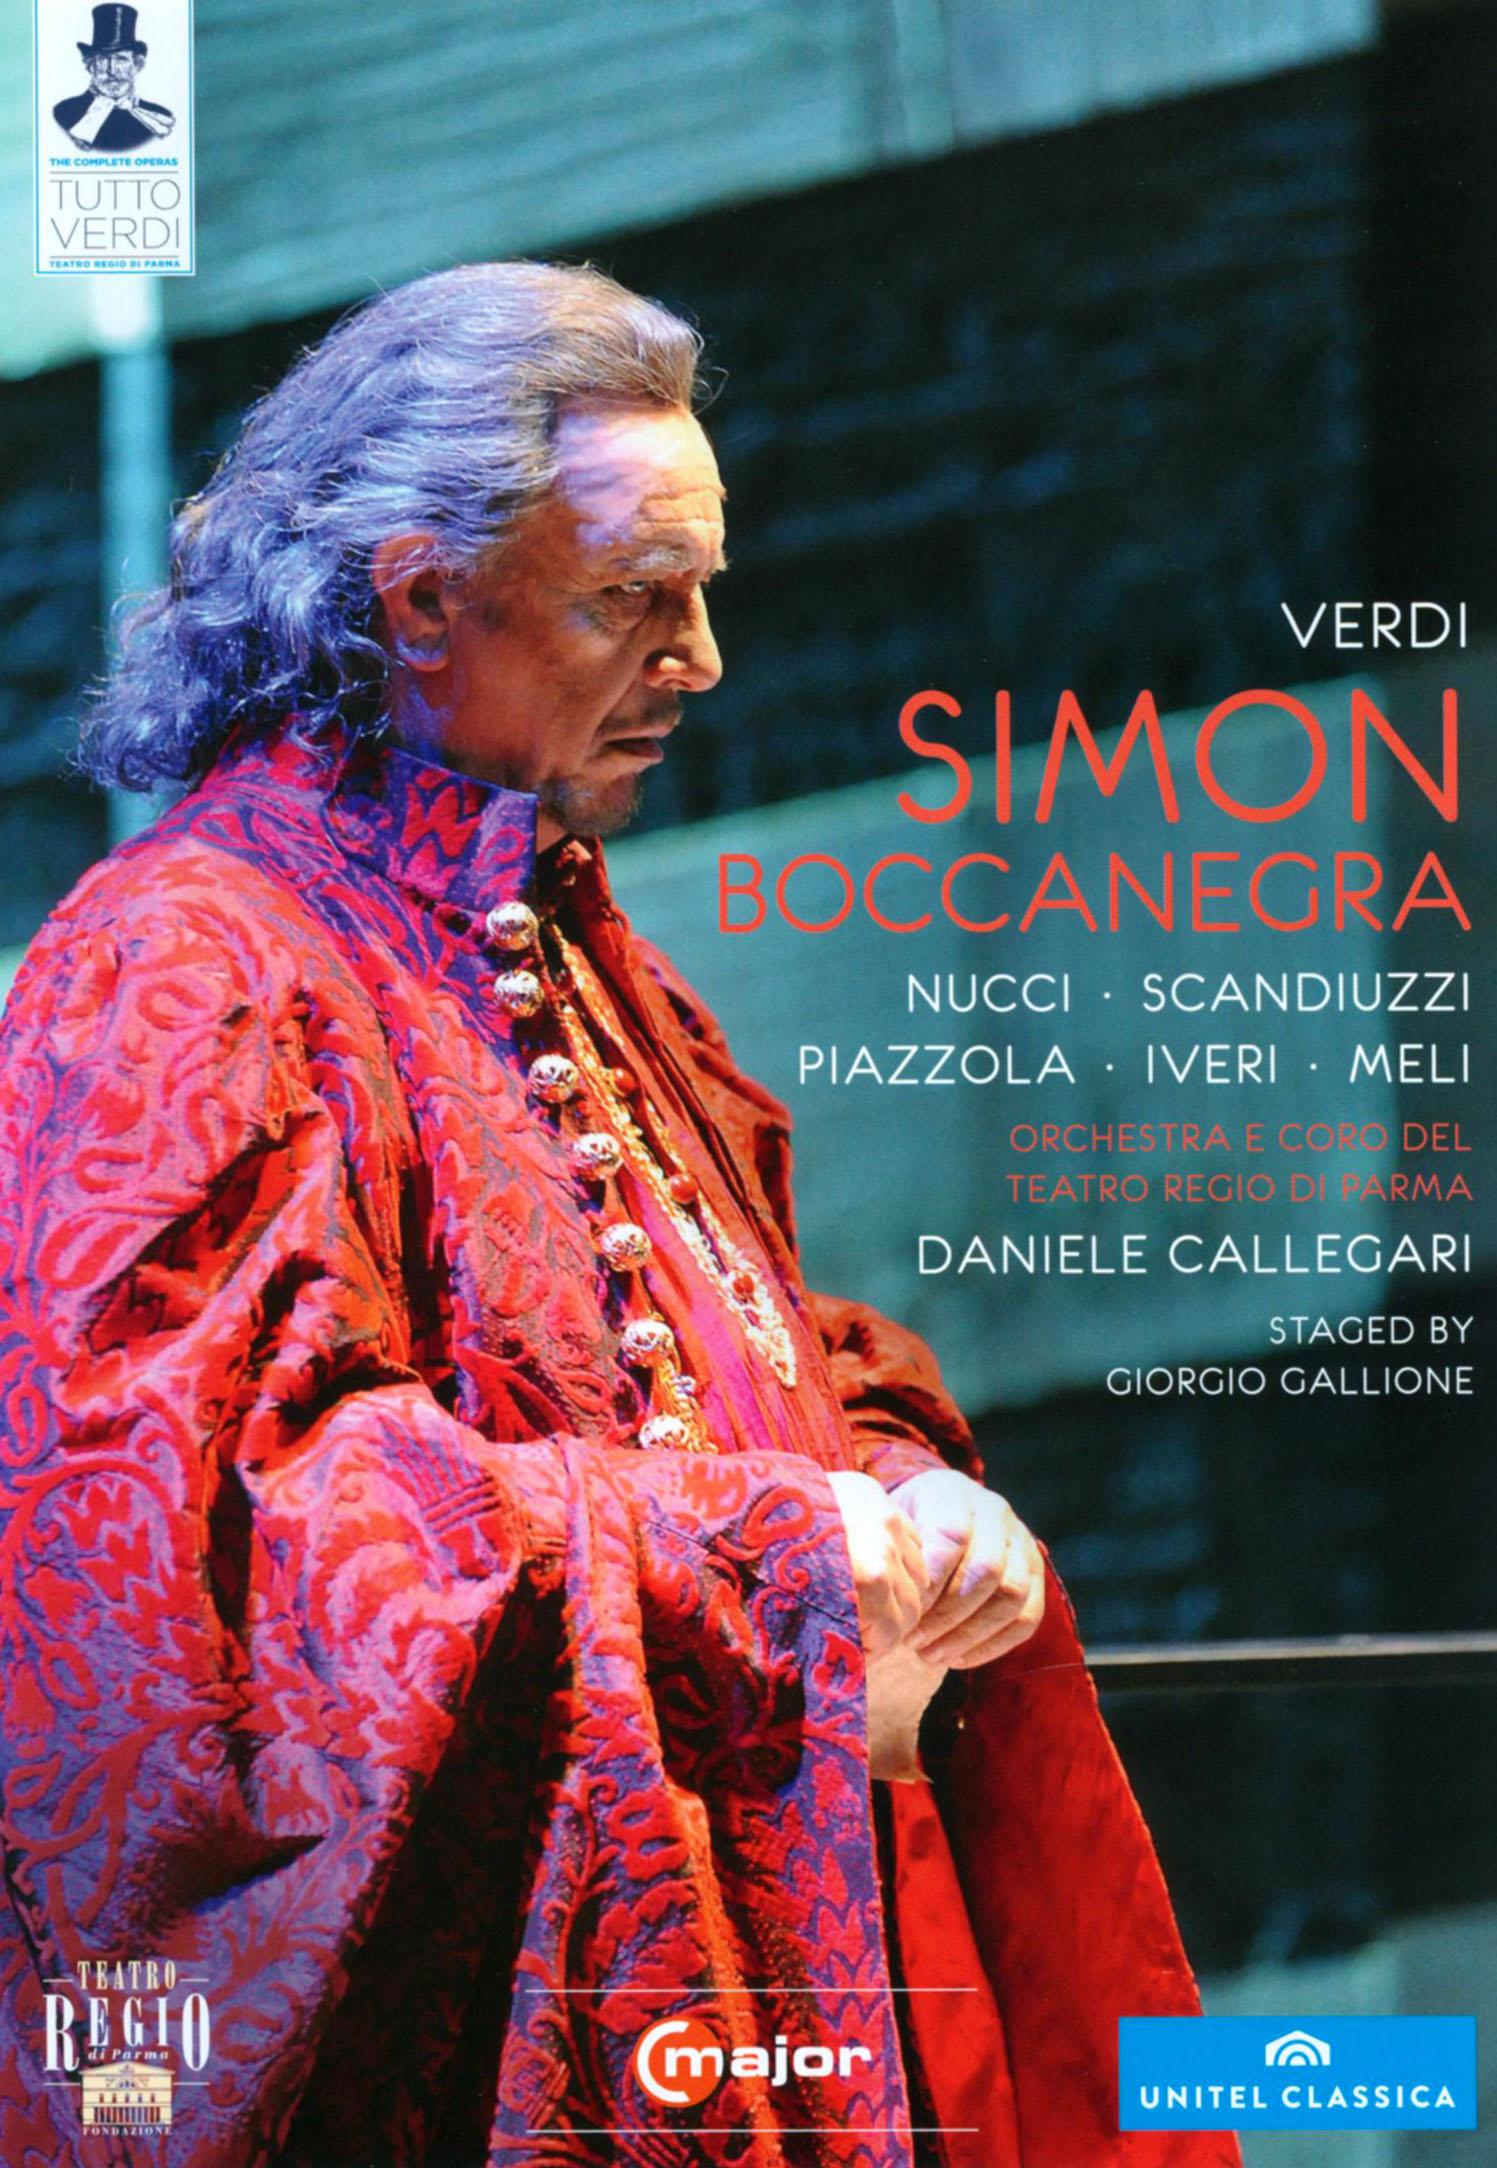 Simon Boccanegra (Teatro Regio di Parma)